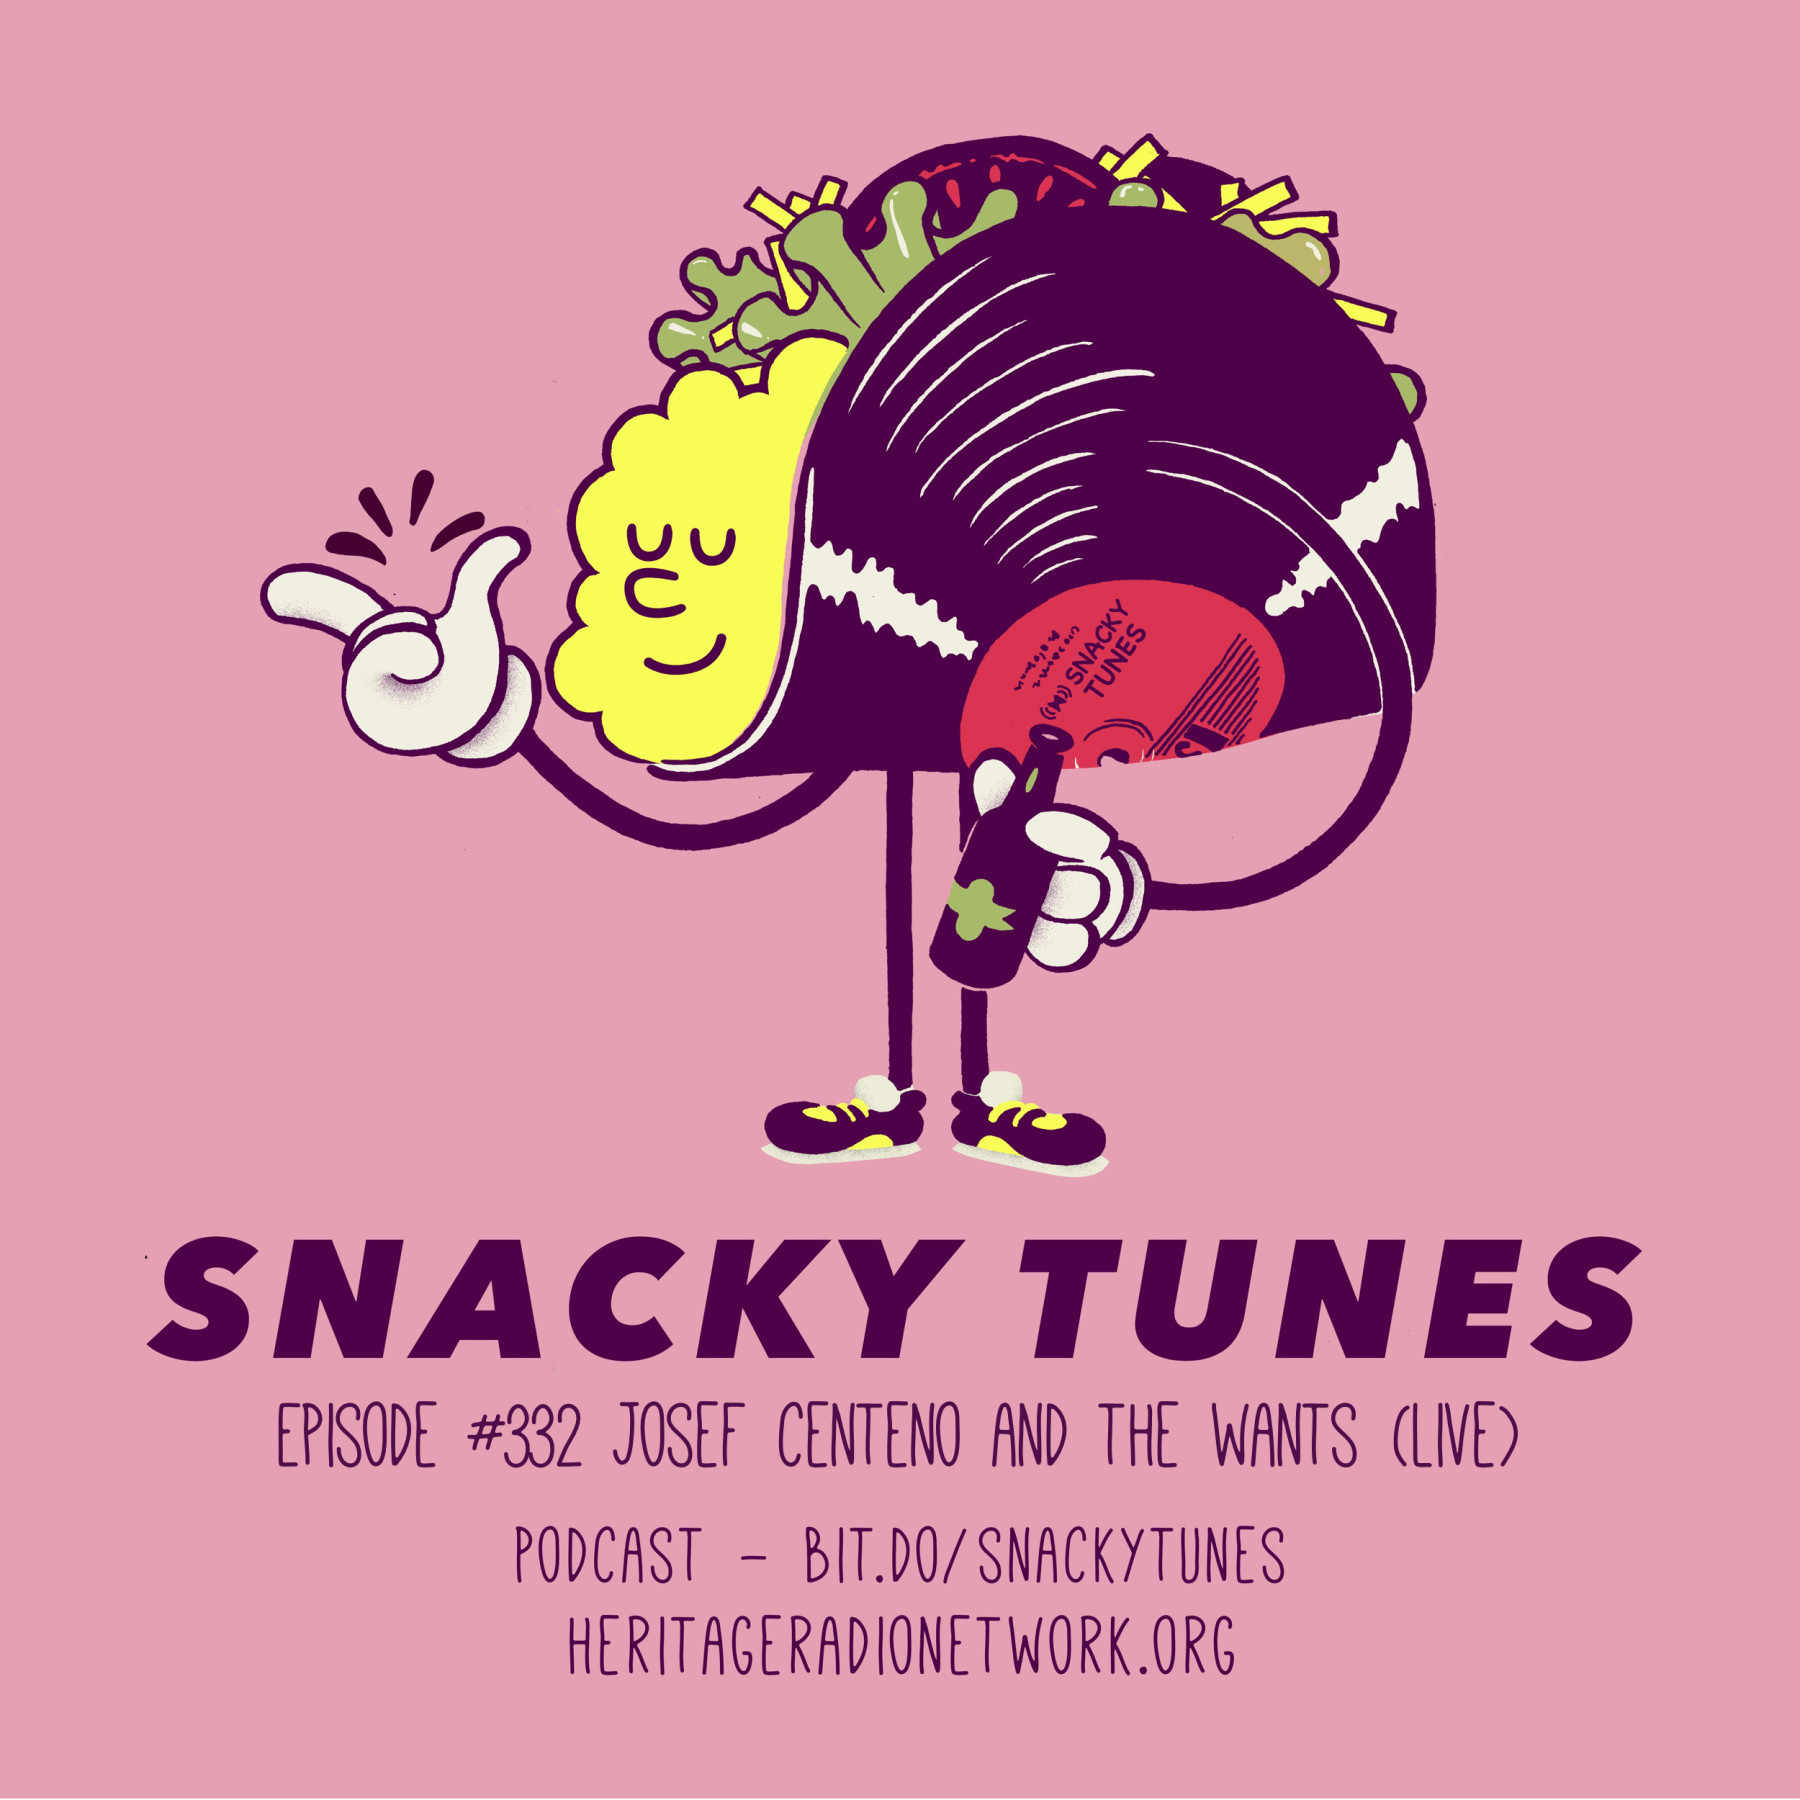 Snacky_Tunes-Podacst_Editable_332.001